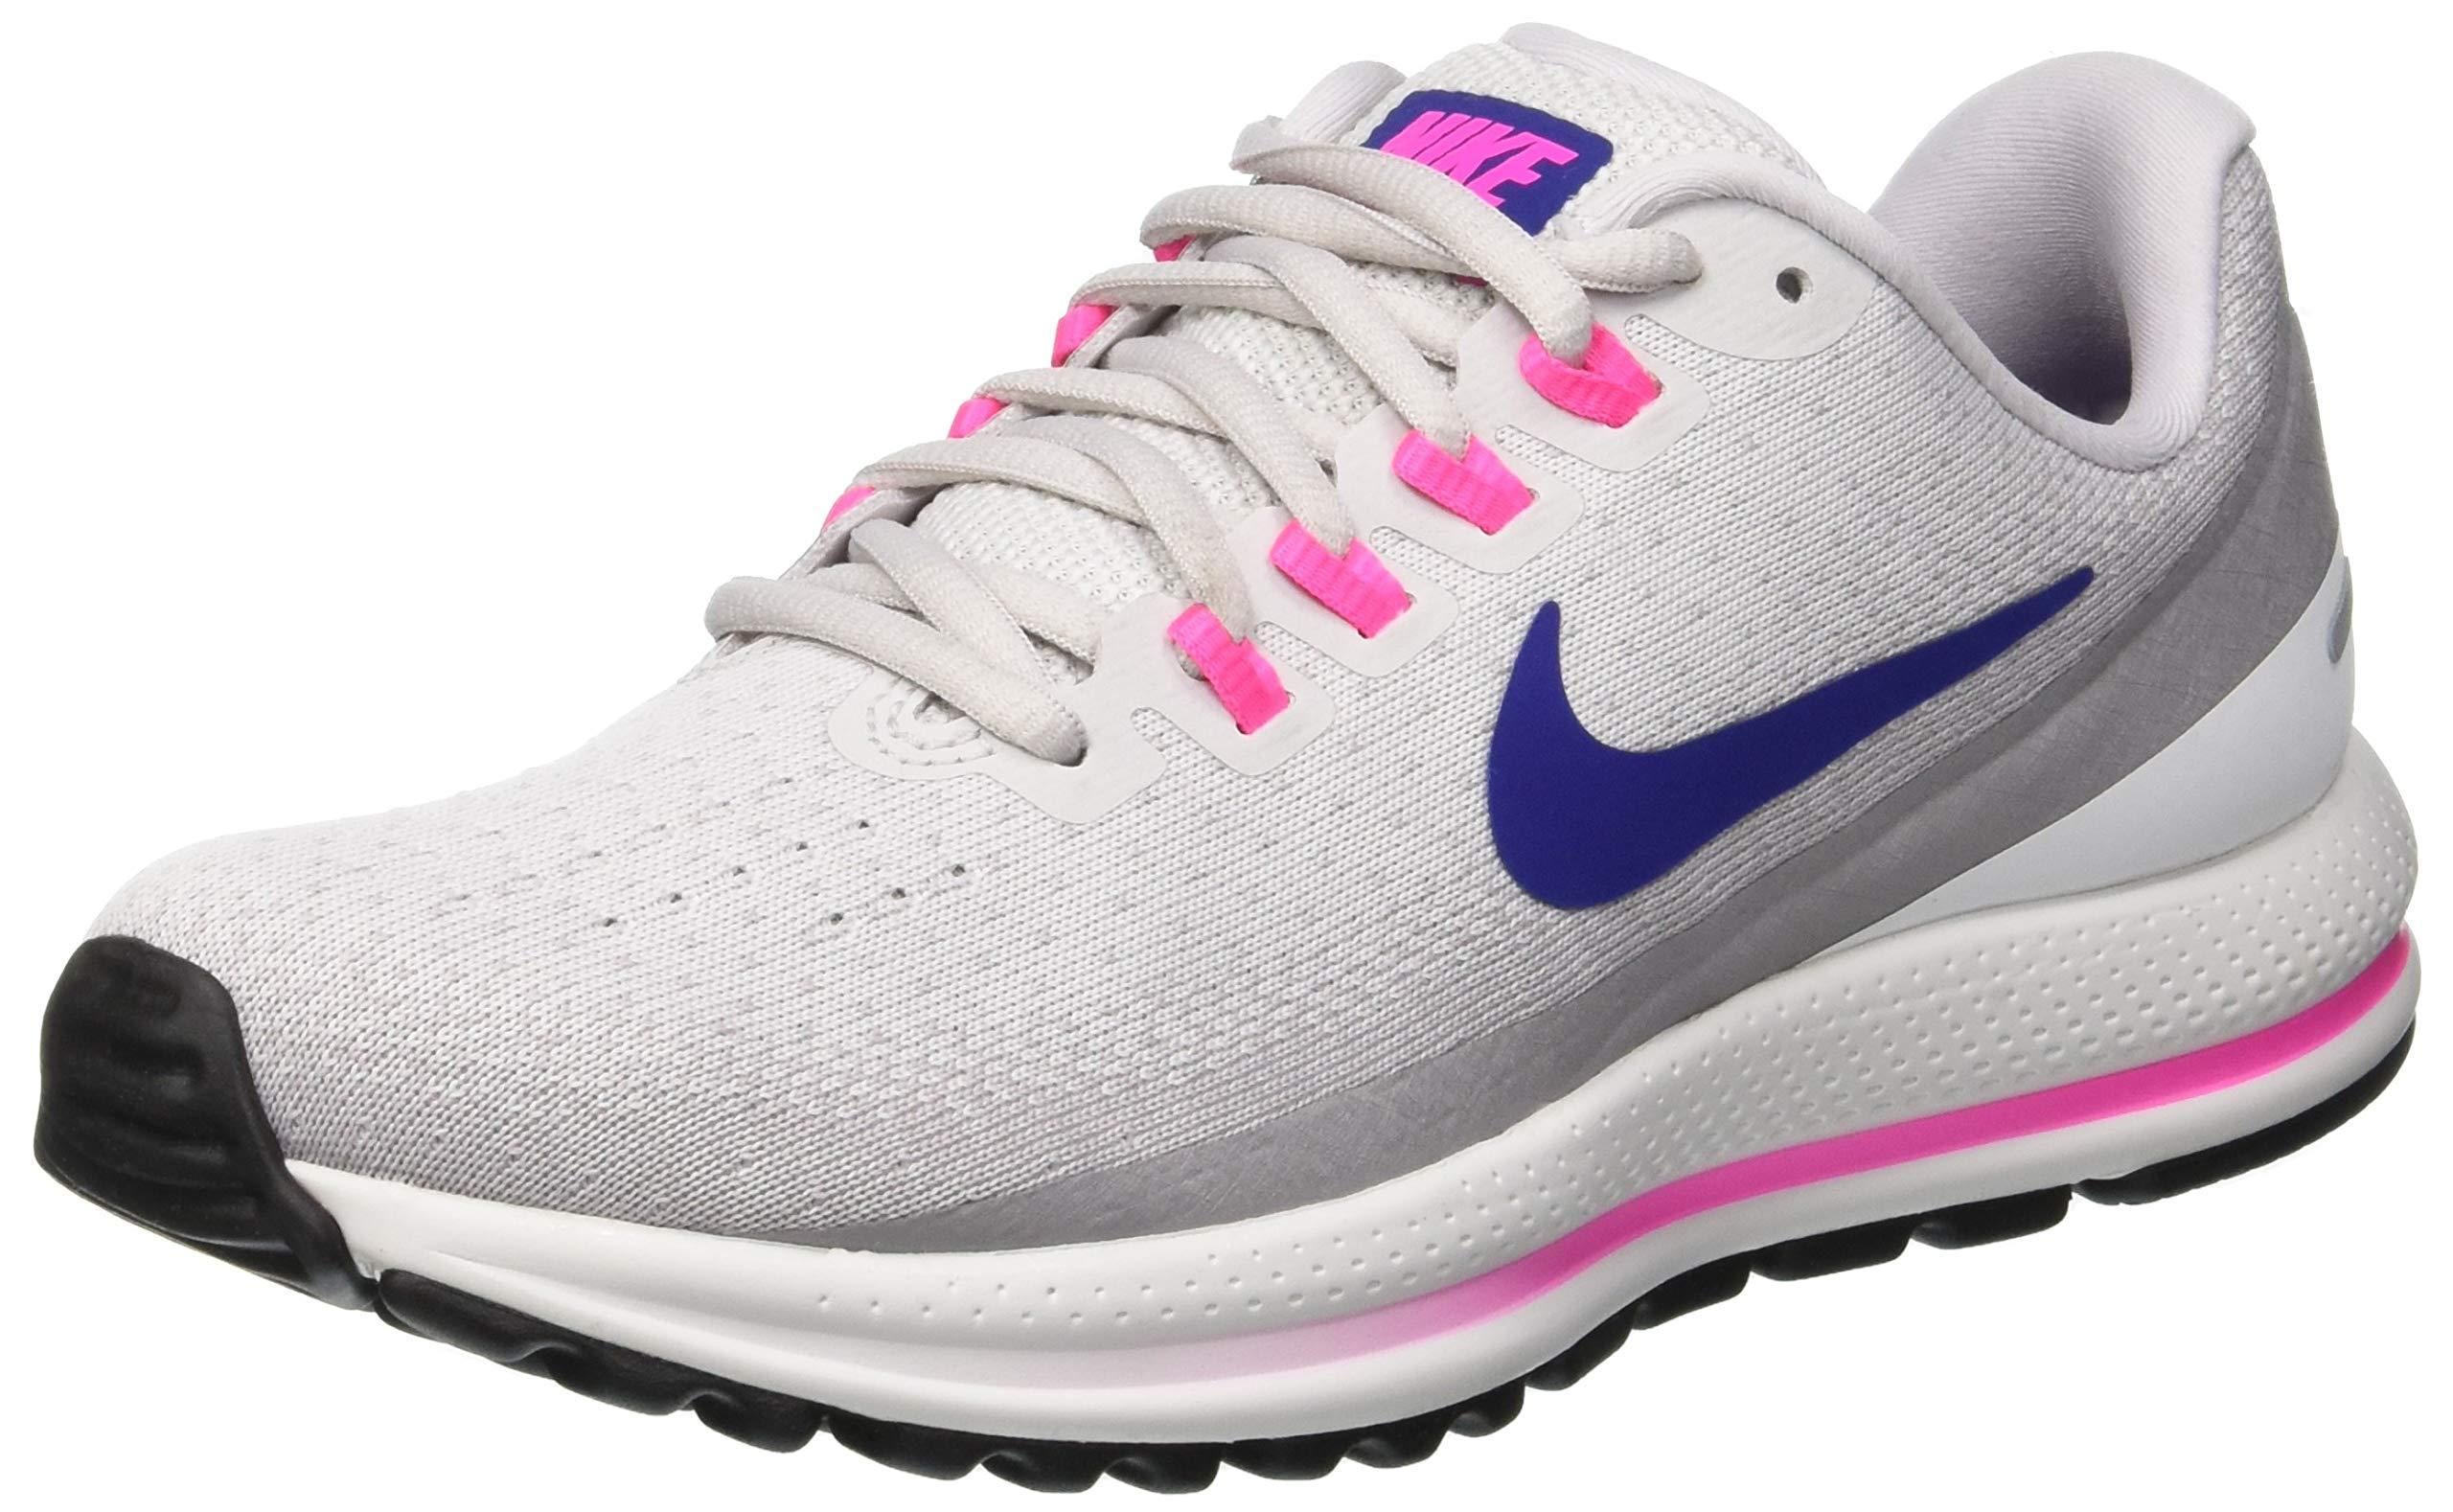 Nike Women's's WMNS Air Zoom Vomero 13